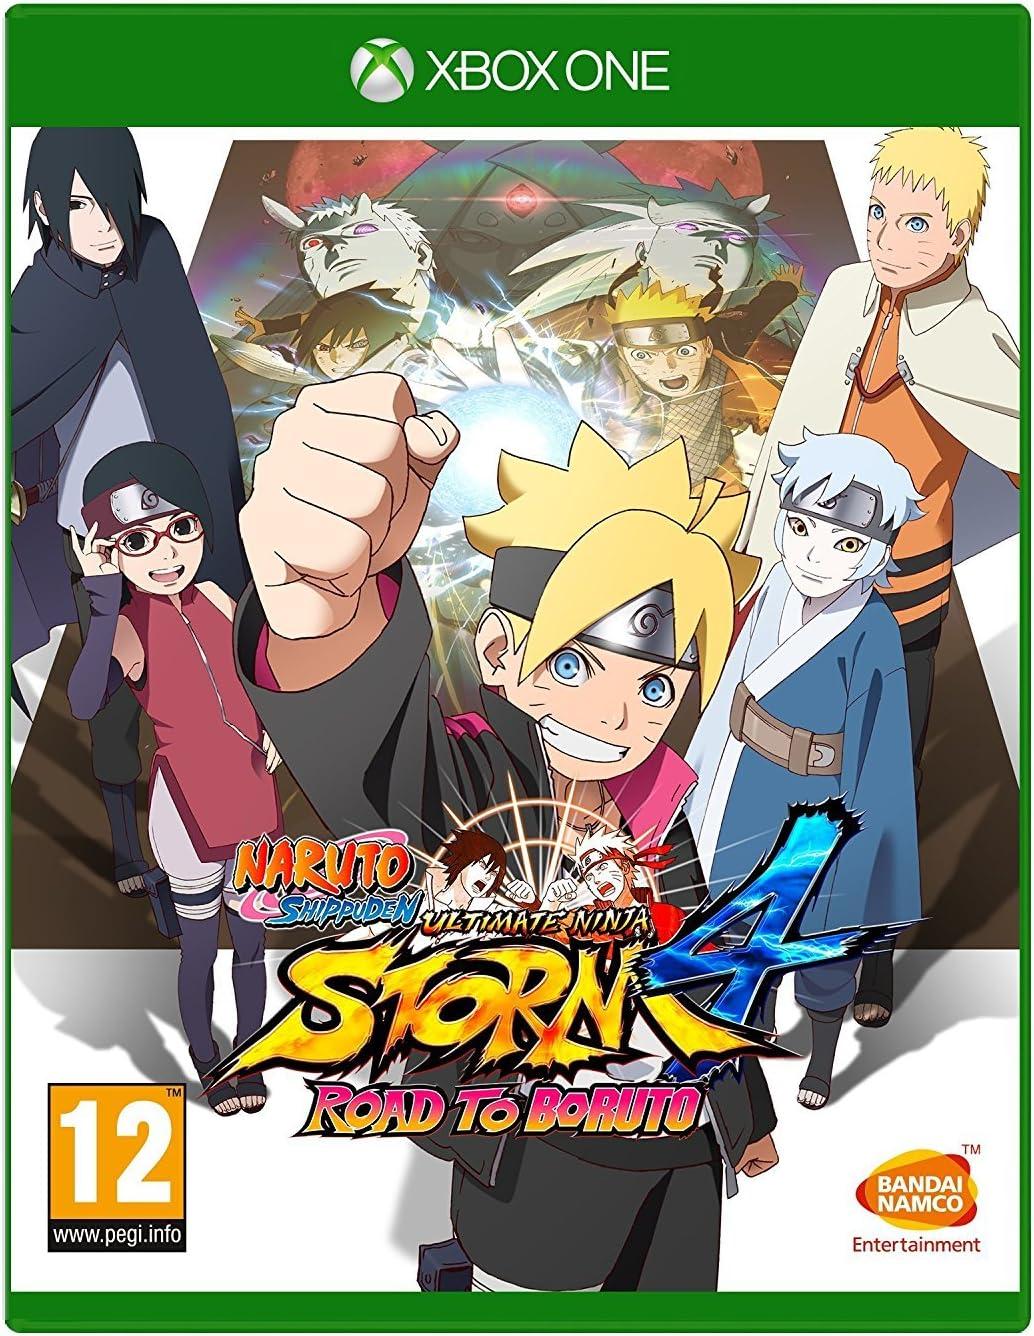 Amazon.com: Naruto Shippuden Ultimate Ninja Storm 4: Road to ...